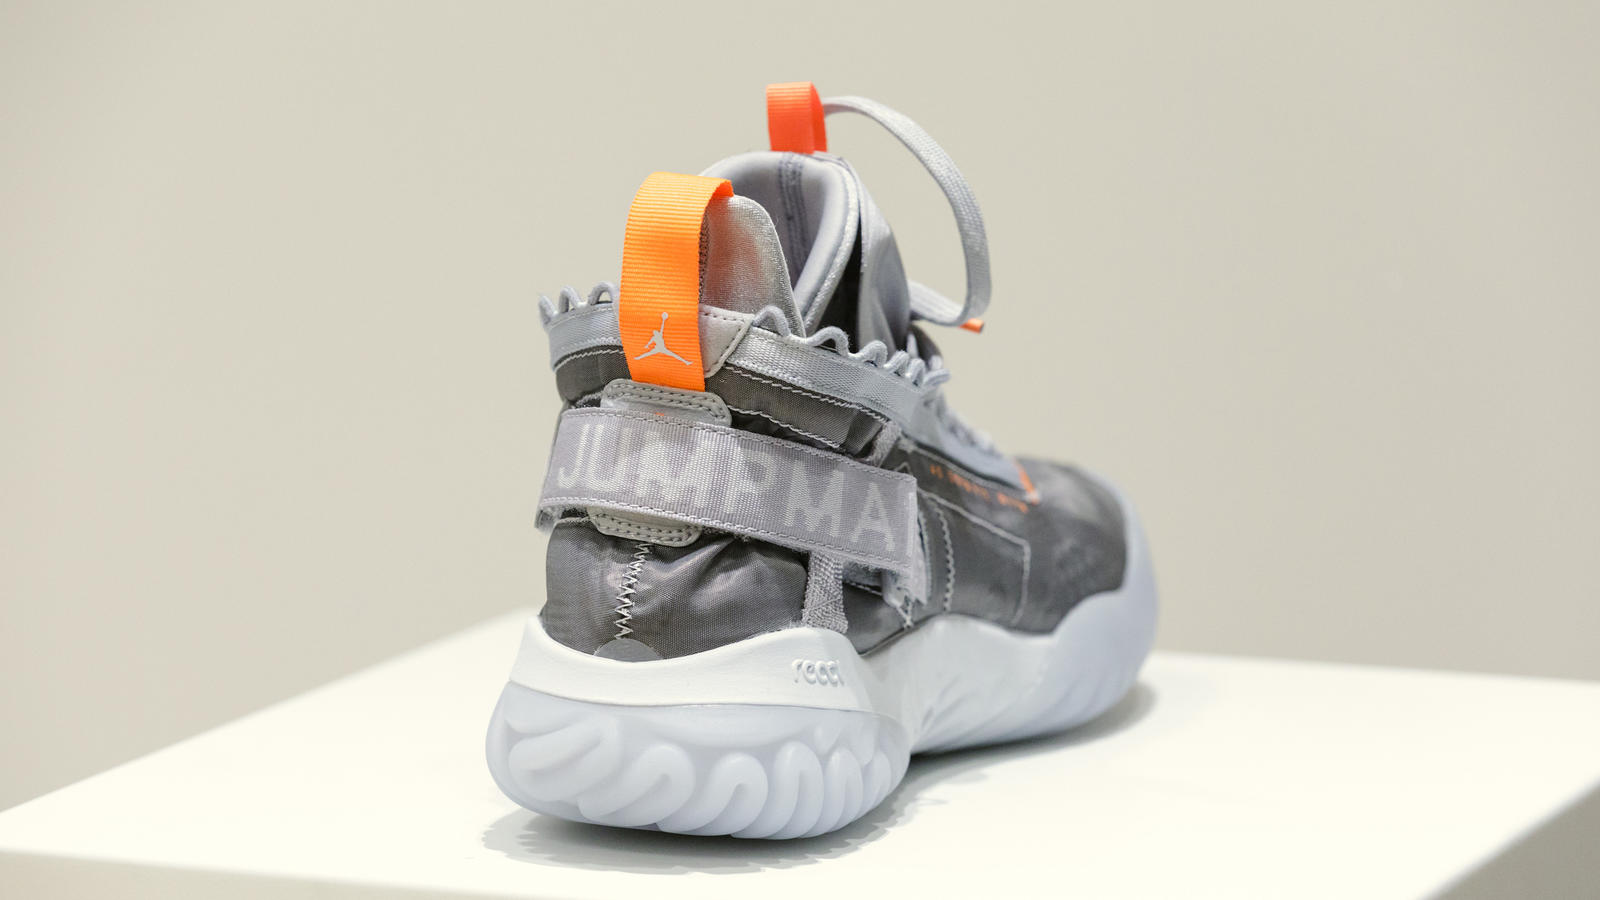 Nike Duel Racer : Marke Nike, Air Jordan, Converse, Dr